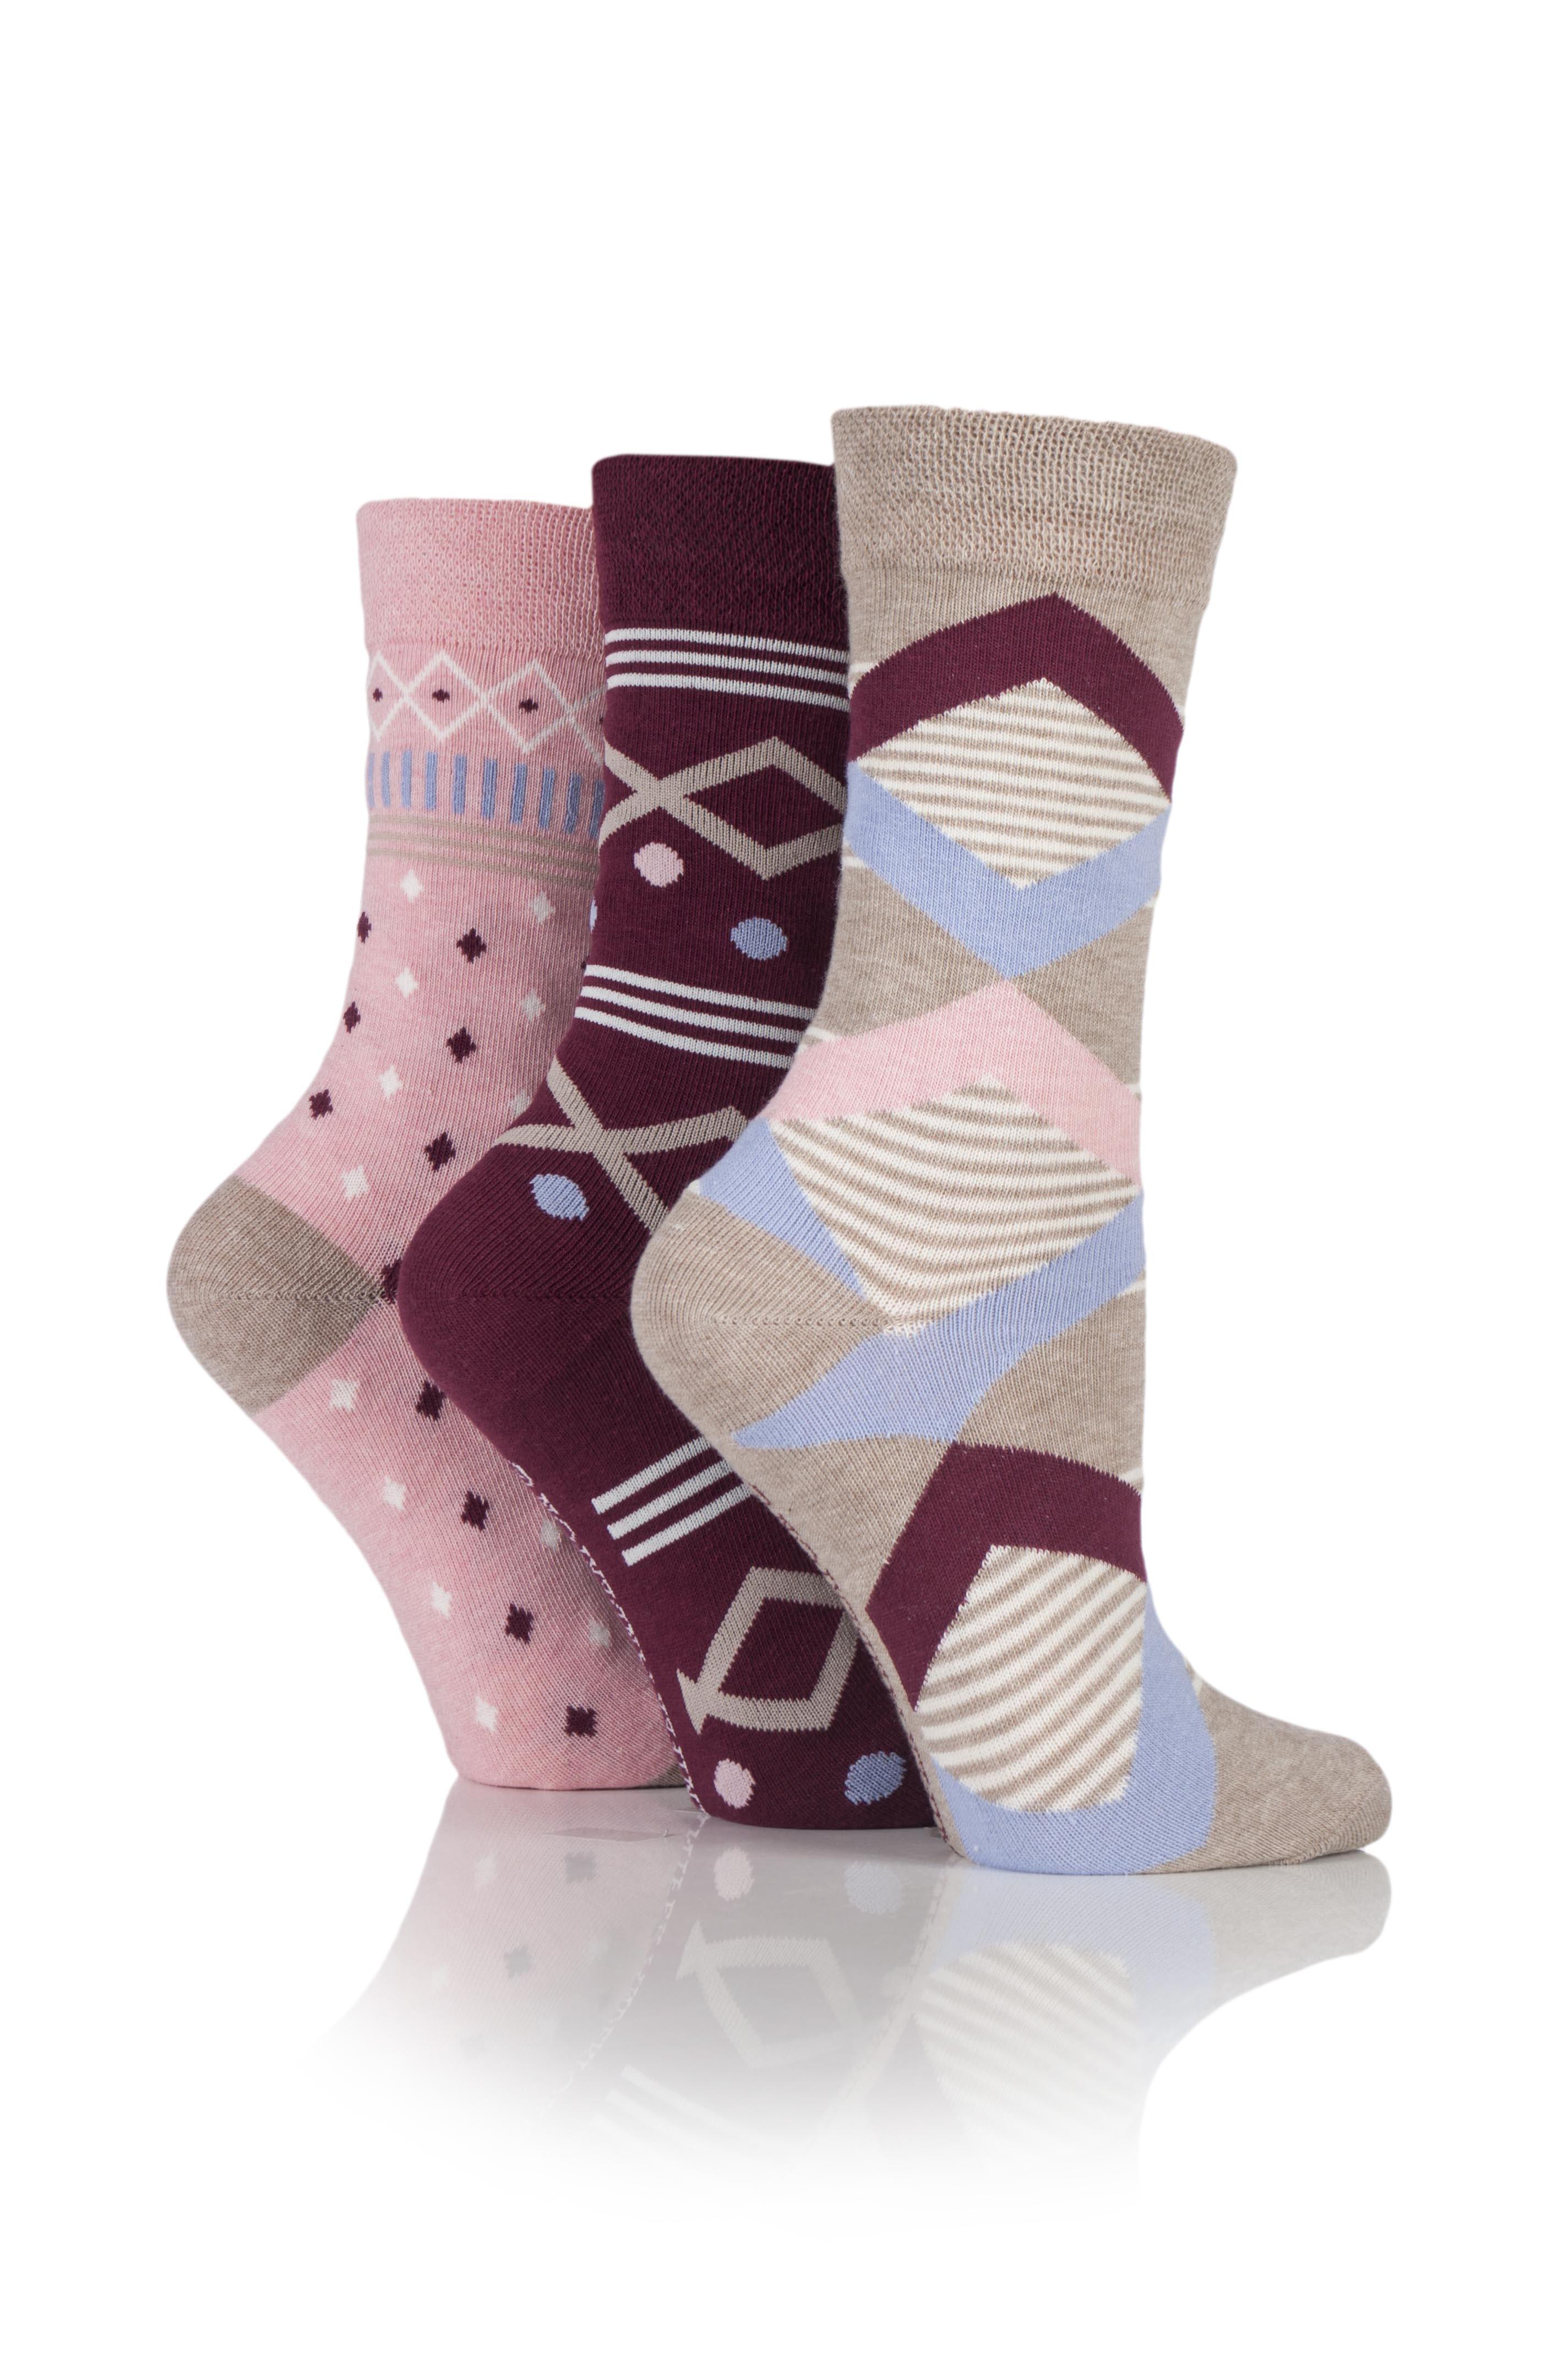 Jennifer Anderton Pack of 3 Mixed Pattern Socks